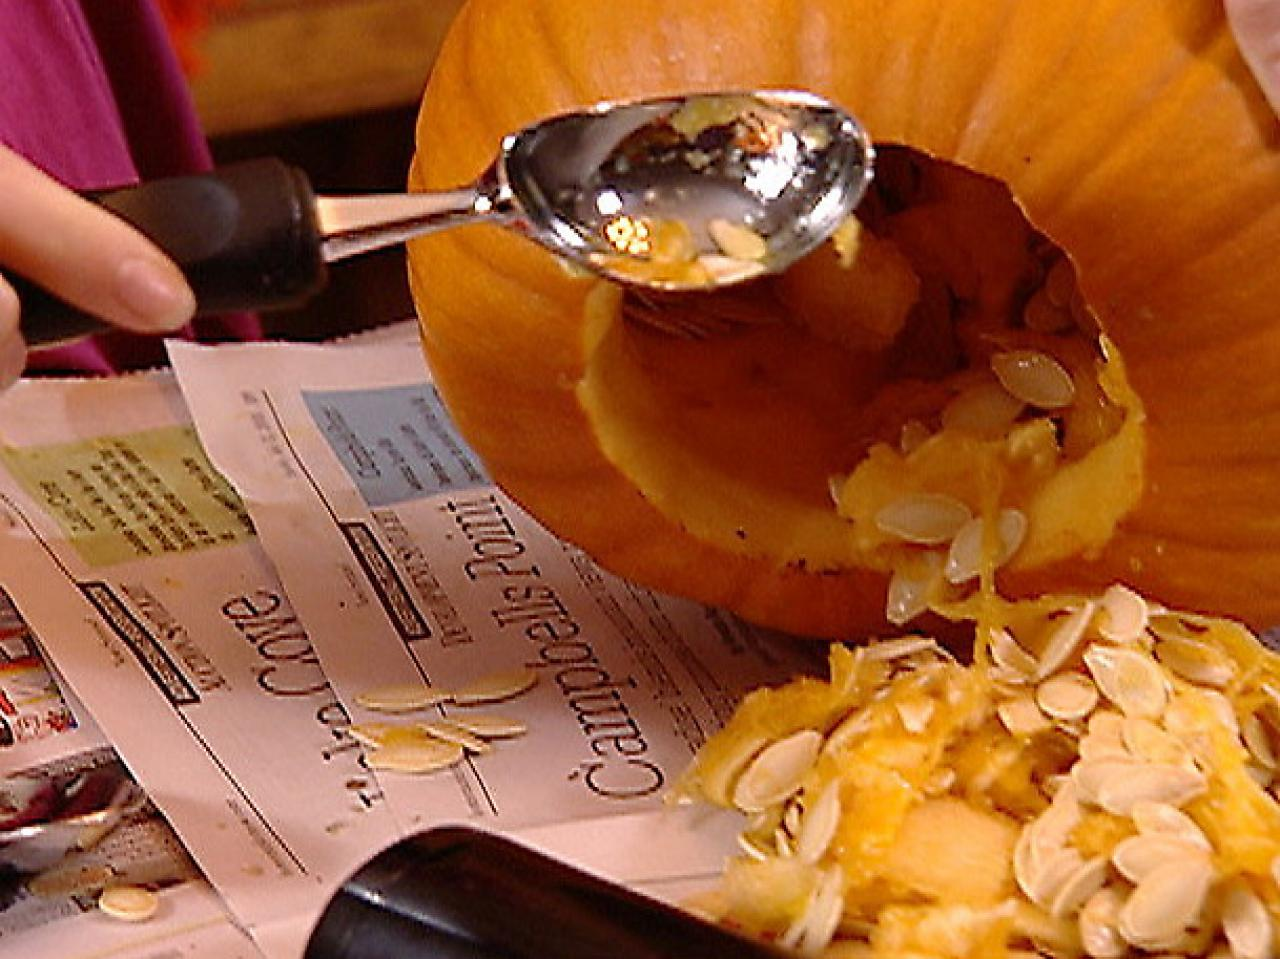 Pumpkin carving tips and tools hgtv